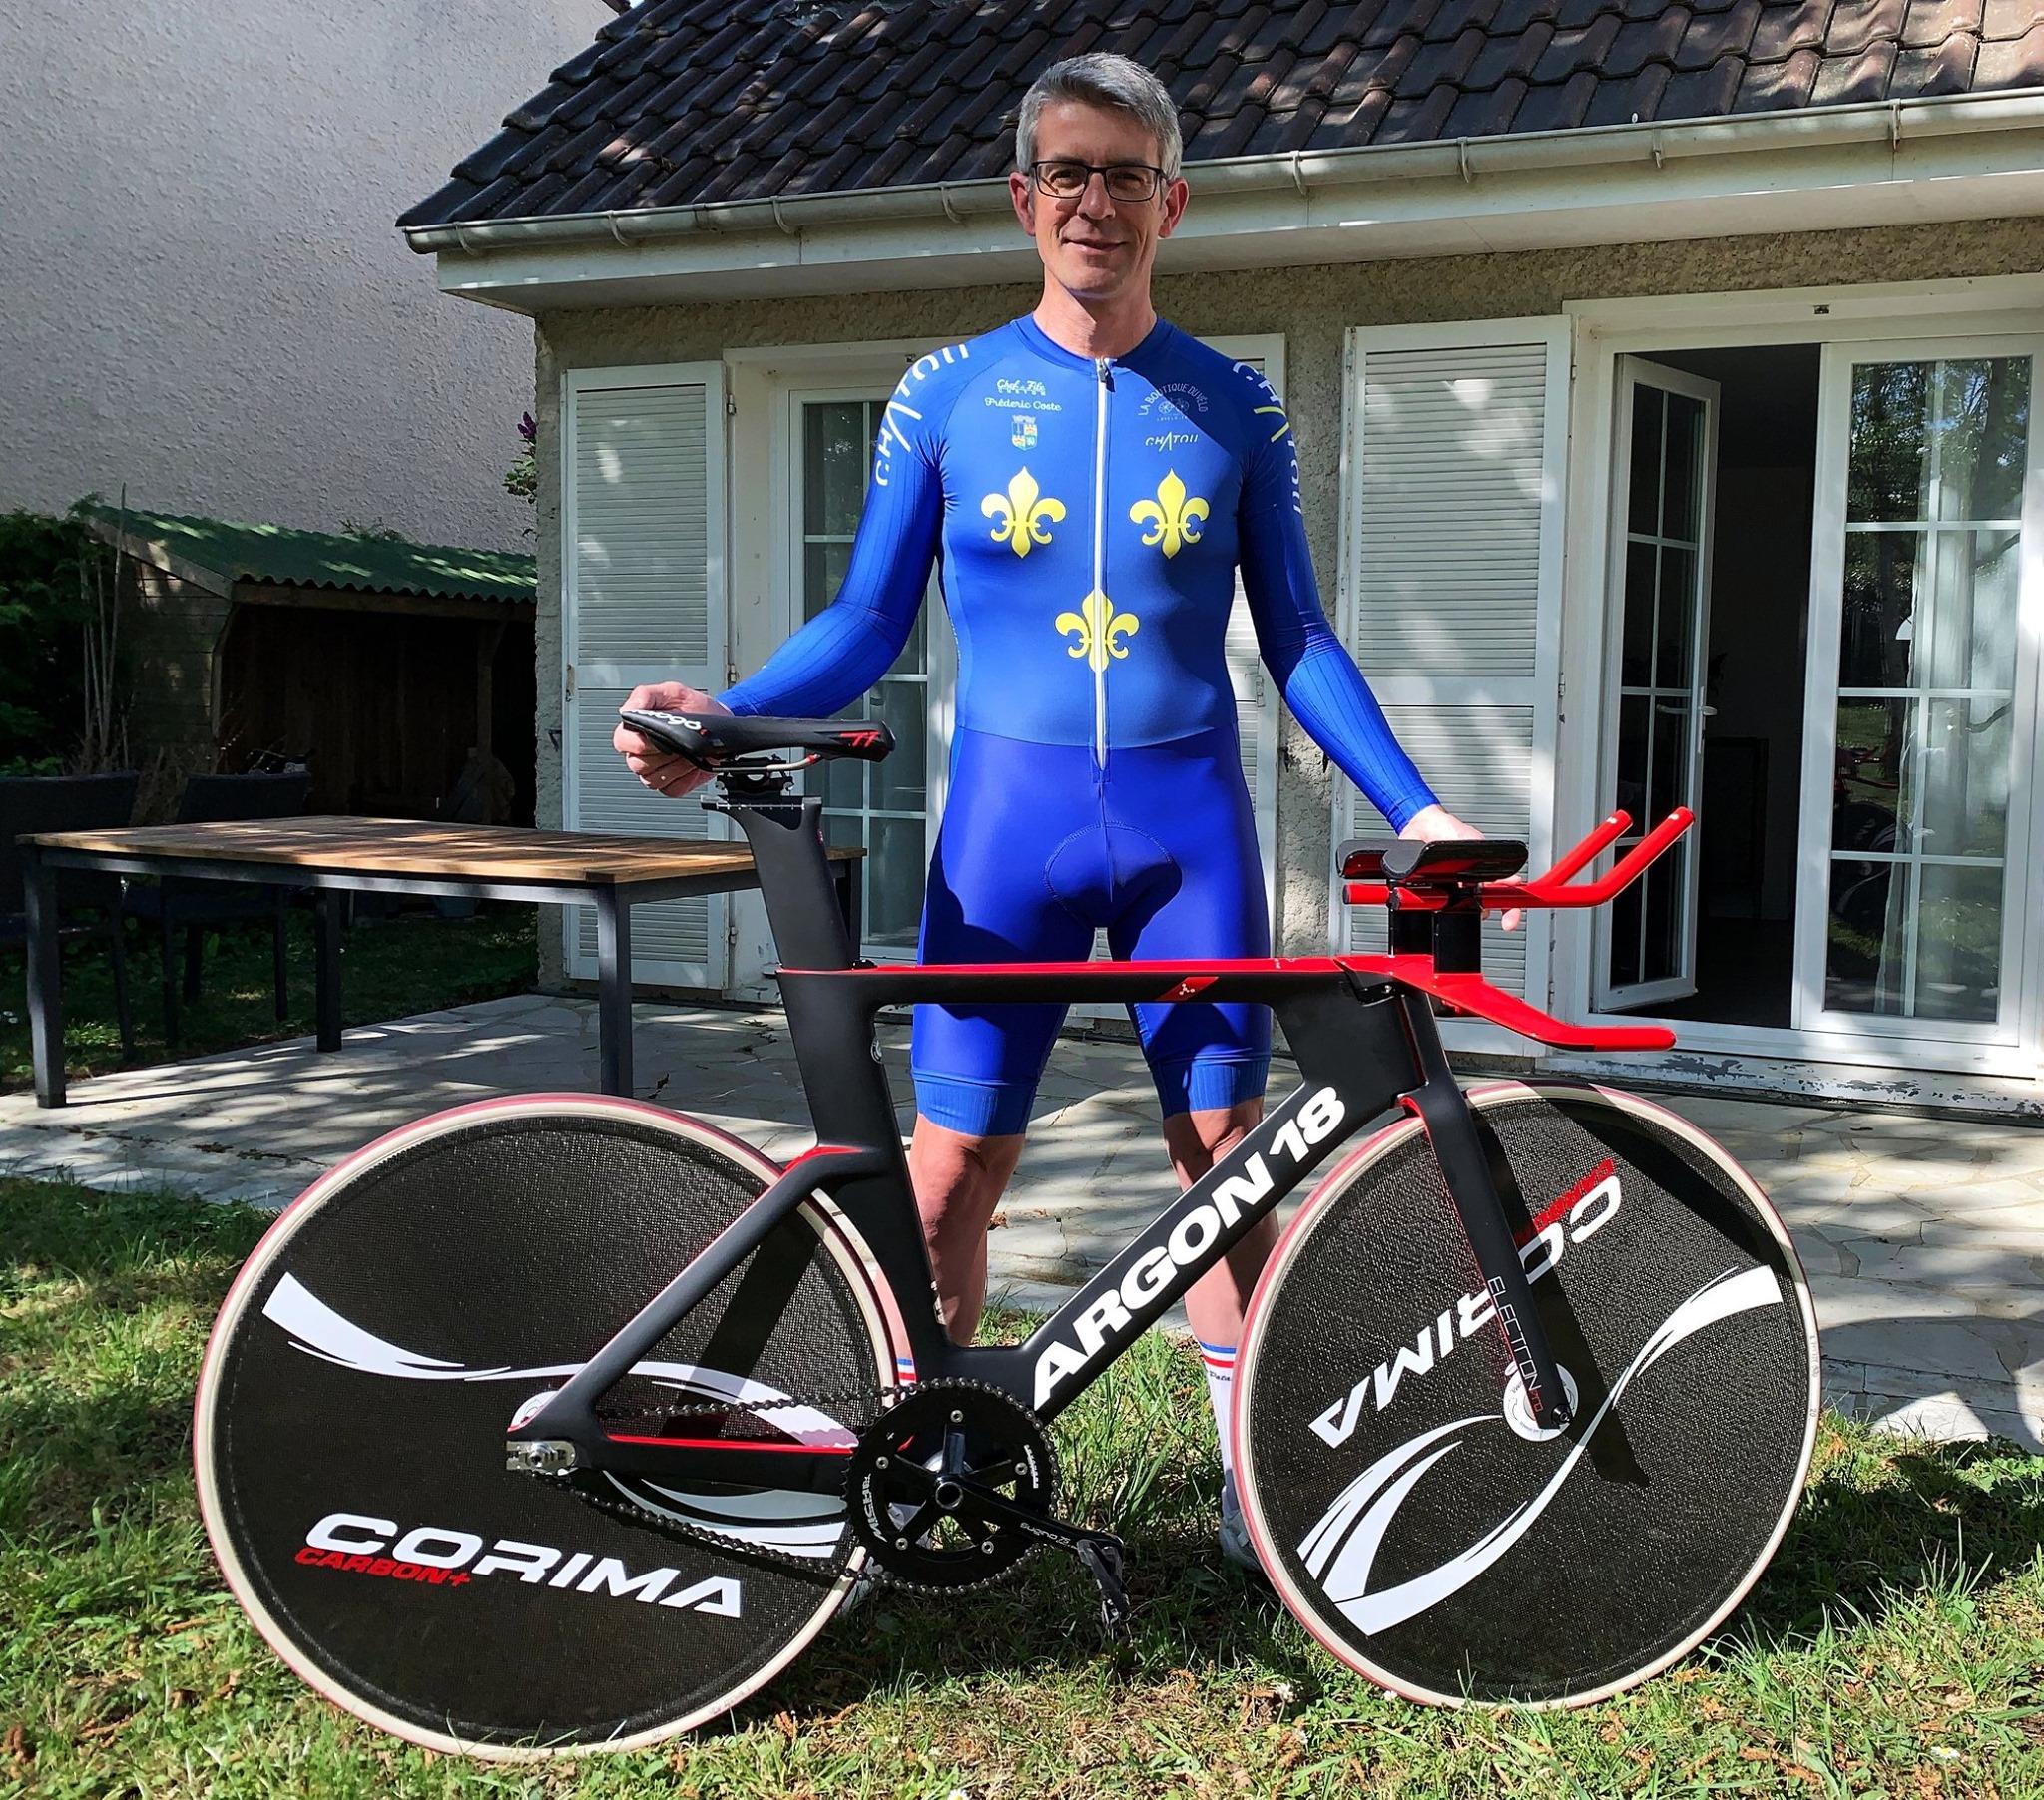 https://teamchatoucyclisme.com/wp-content/uploads/2020/11/94490176_1009994266064025_2832452544263880704_o.jpg